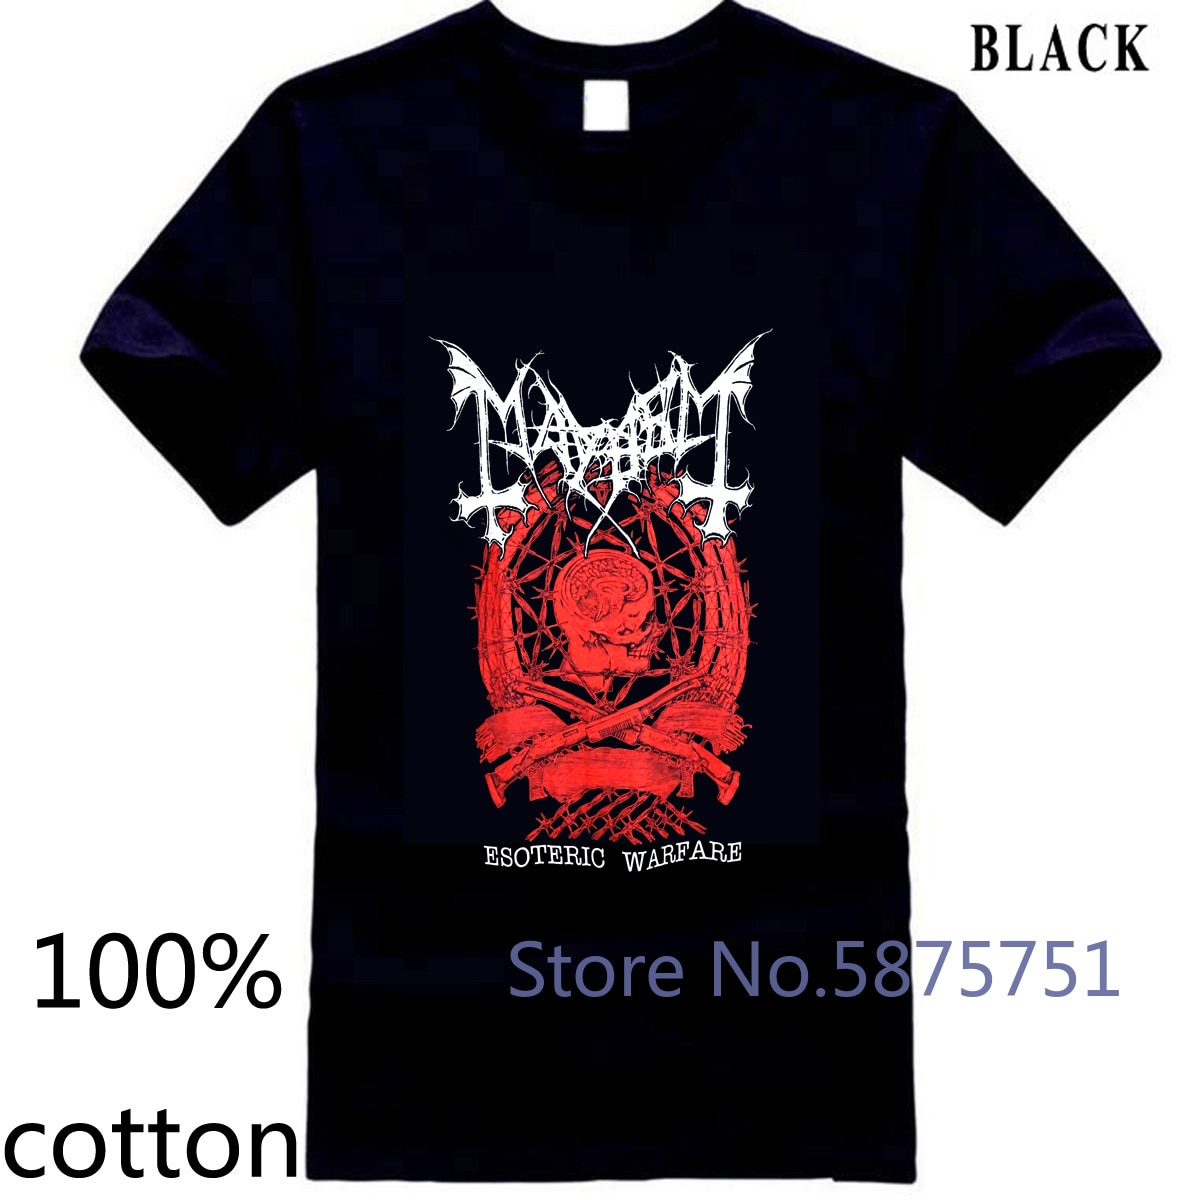 BNWT Mayhem Esoterische Warfare Crest Schwarz Band Heiße Neue Männer männer t shirt t-shirt tops tees 100% baumwolle oansatz 3XL 4XL 5XL